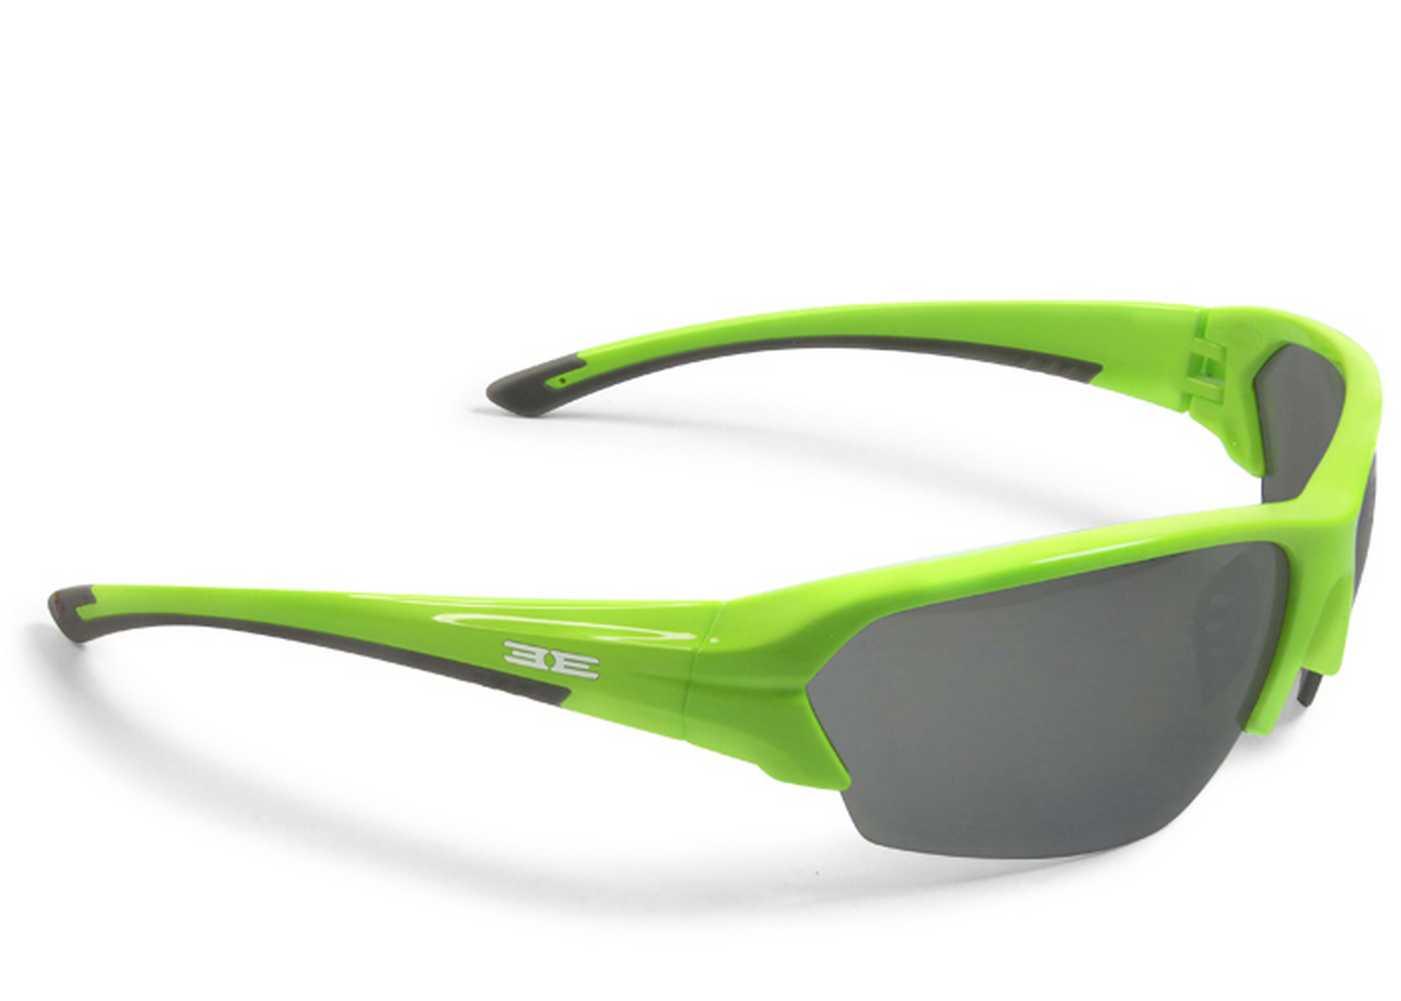 970a28da4d Epoch Eyewear Sunglasses Epoch 2 With Microfiber Bag Select Colors ...